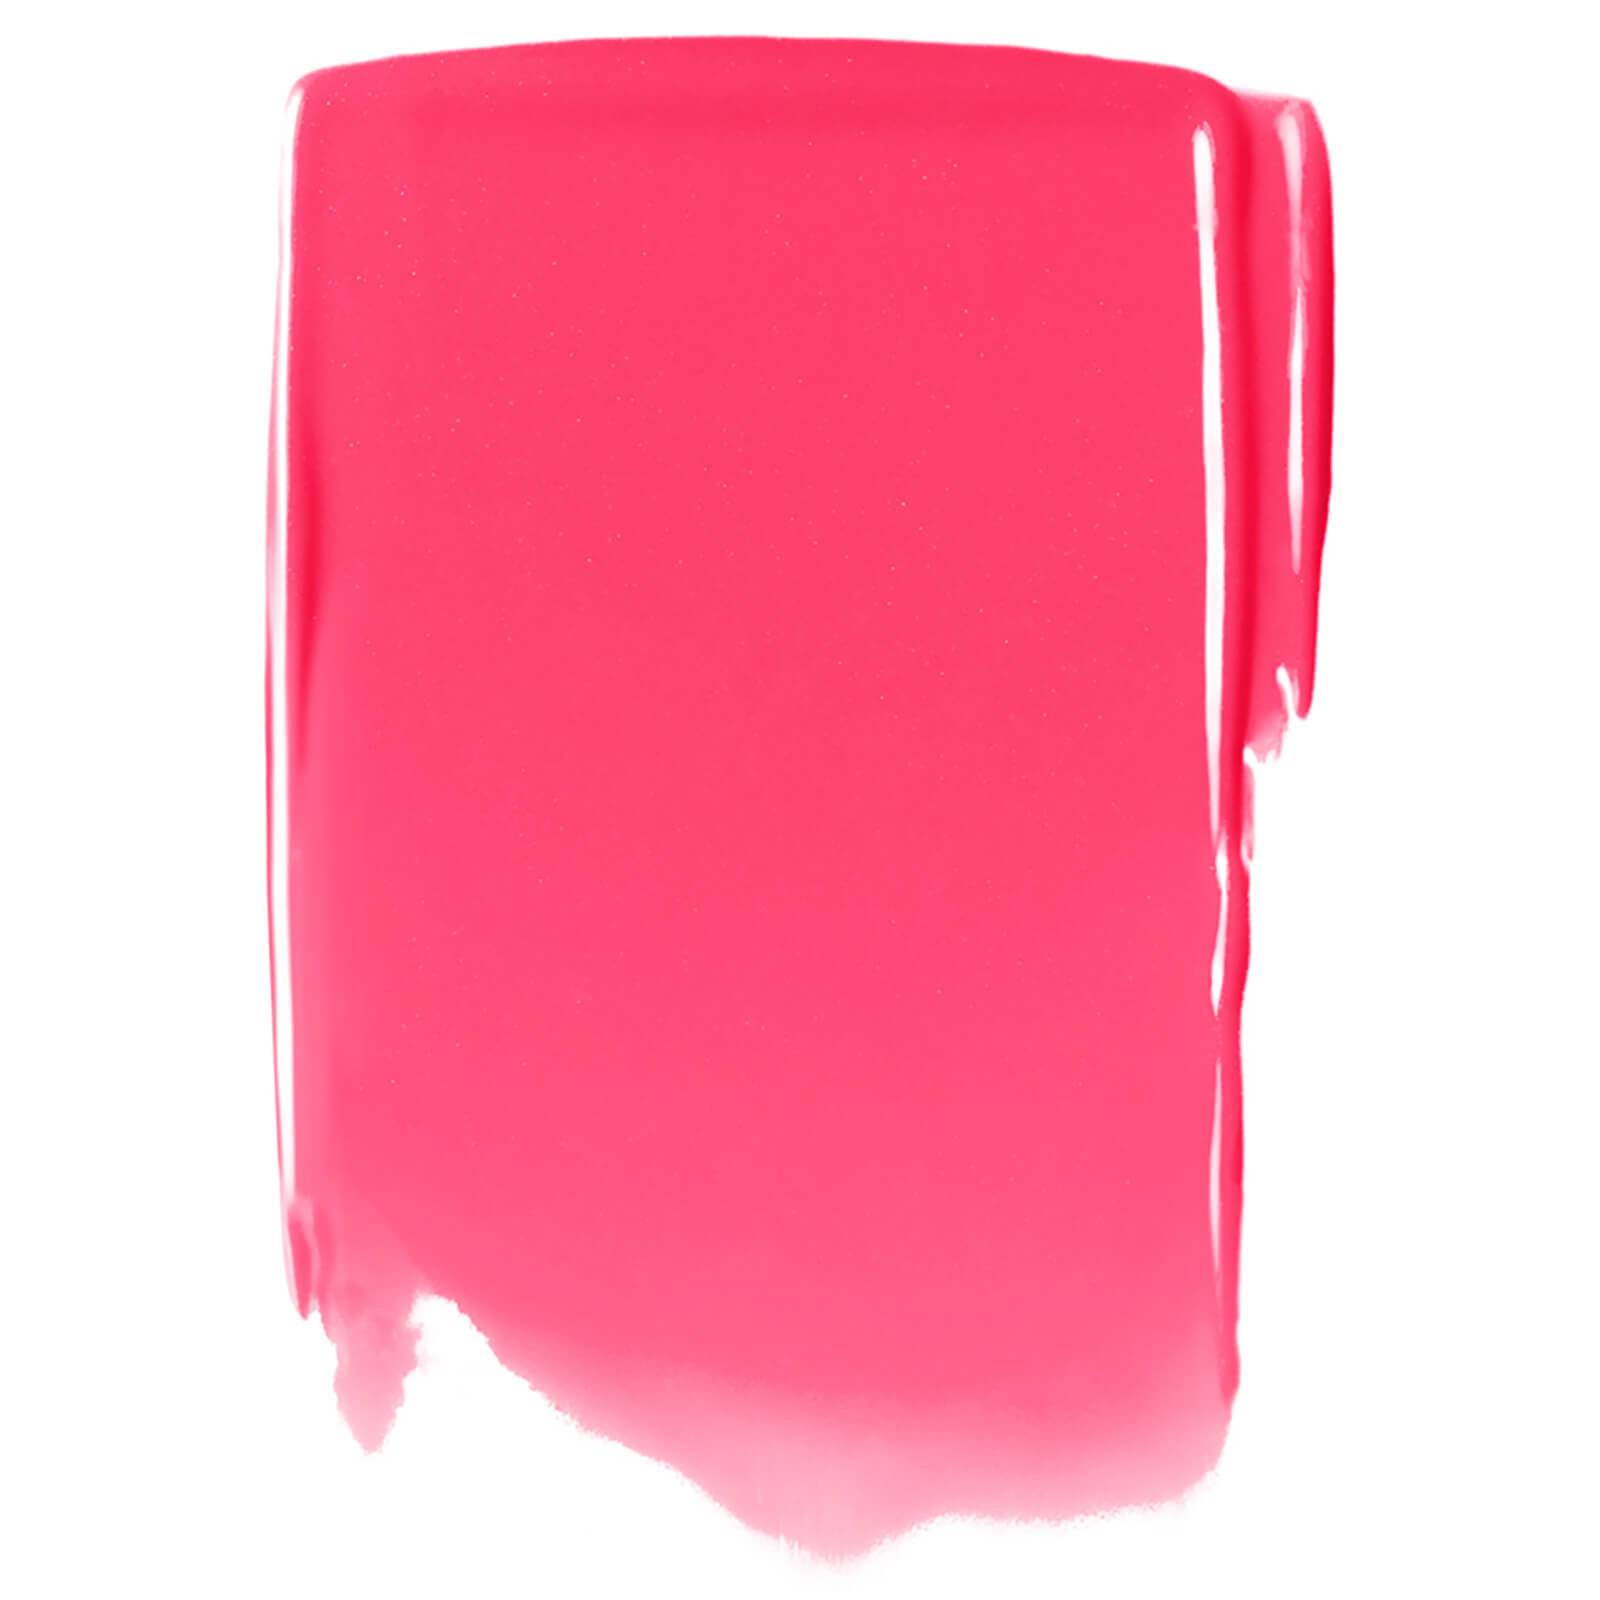 NARS Cosmetics Powermatte Lip Pigment 5.5ml (Various Shades) - Low Rider